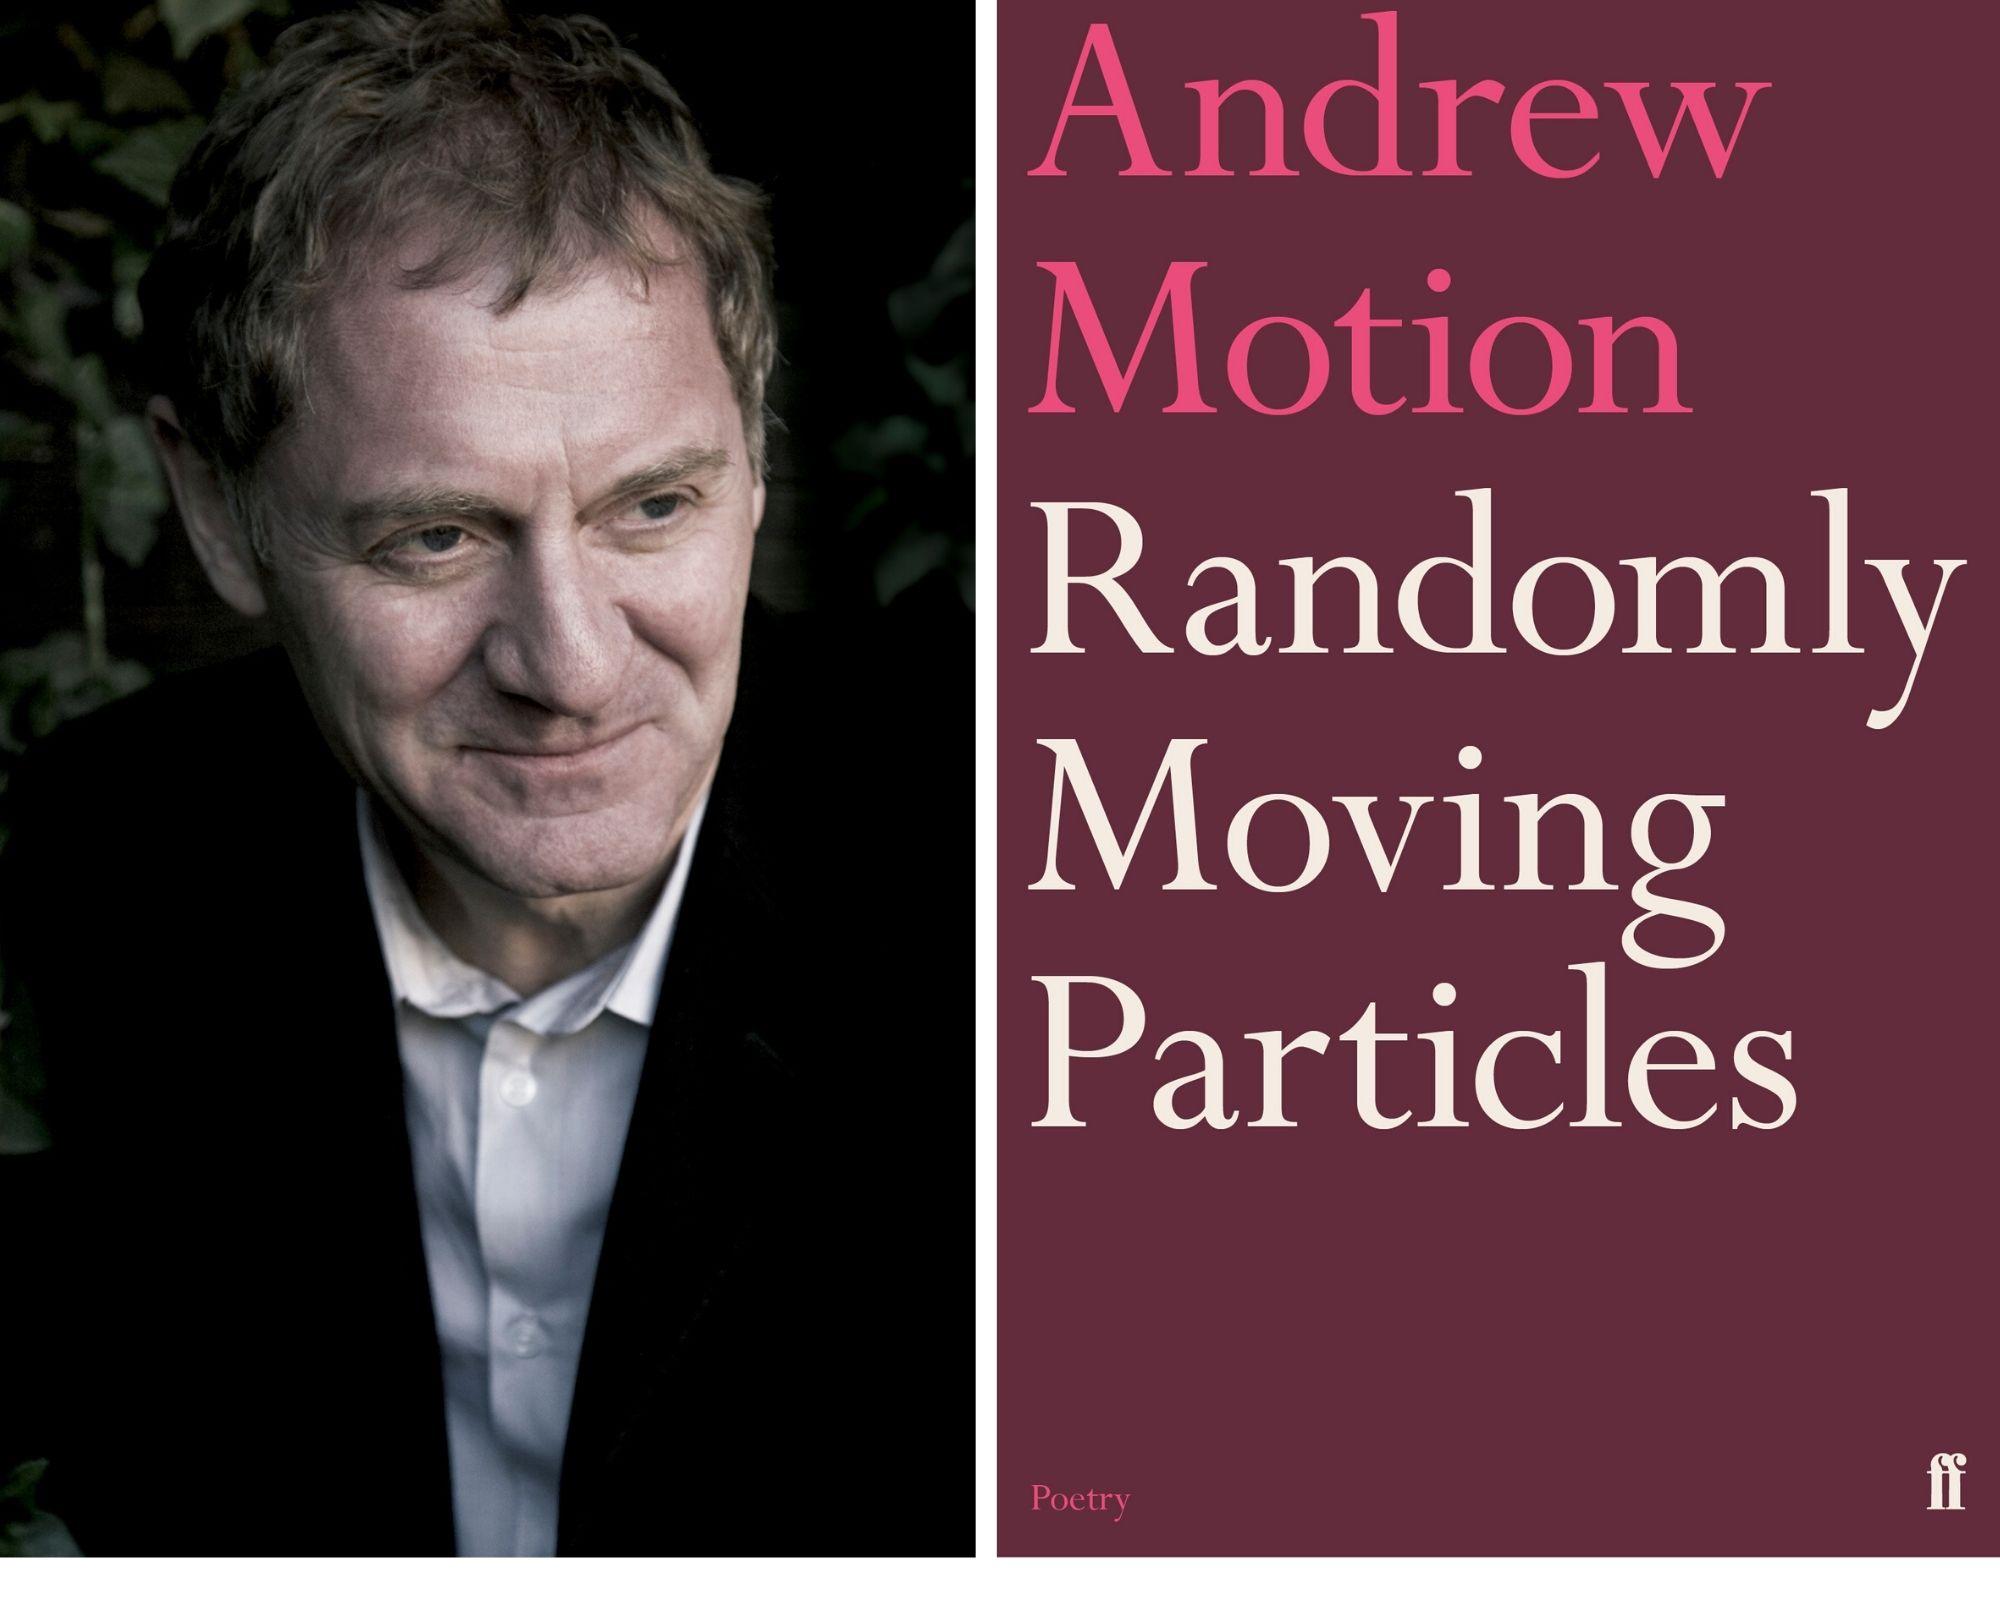 Andrew Motion 1